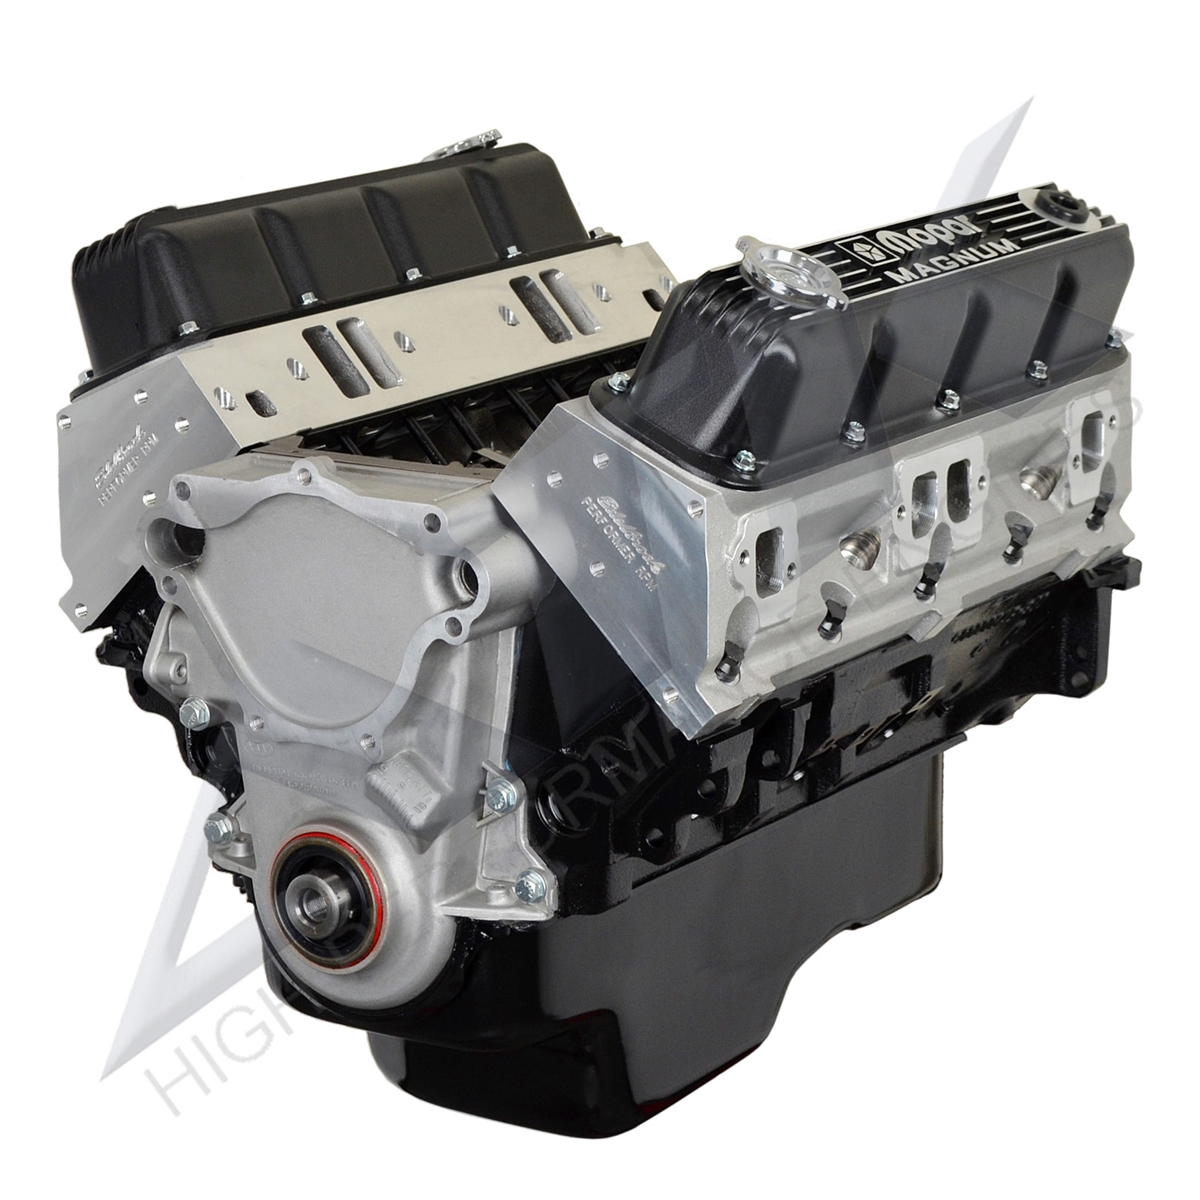 ATK HP46-Mag Chrysler 408 Base Engine 465HP